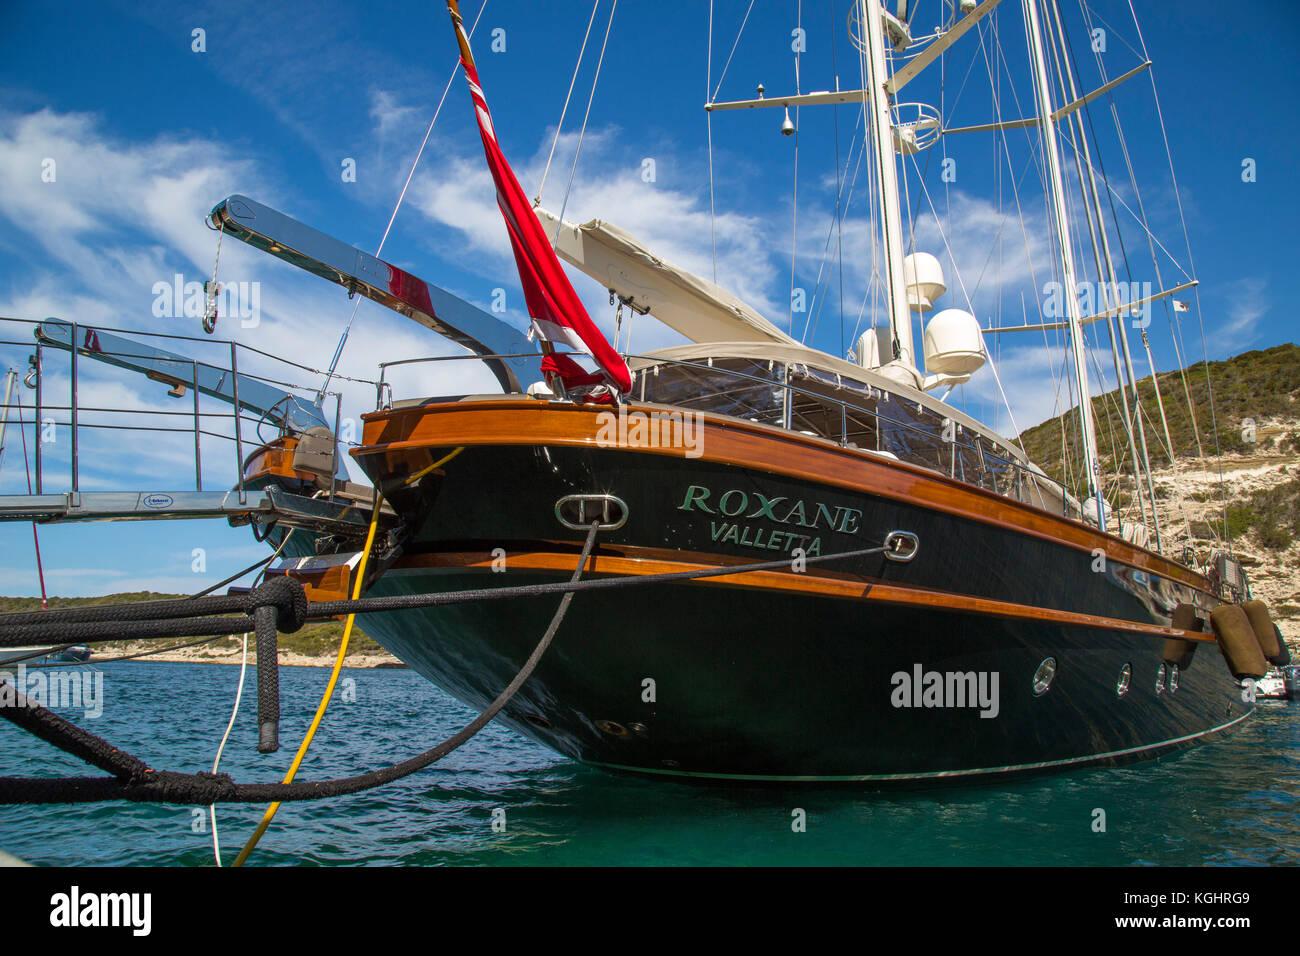 Luxus segelyacht holz  Corsica Bonifacio Super Yacht Stockfotos & Corsica Bonifacio Super ...